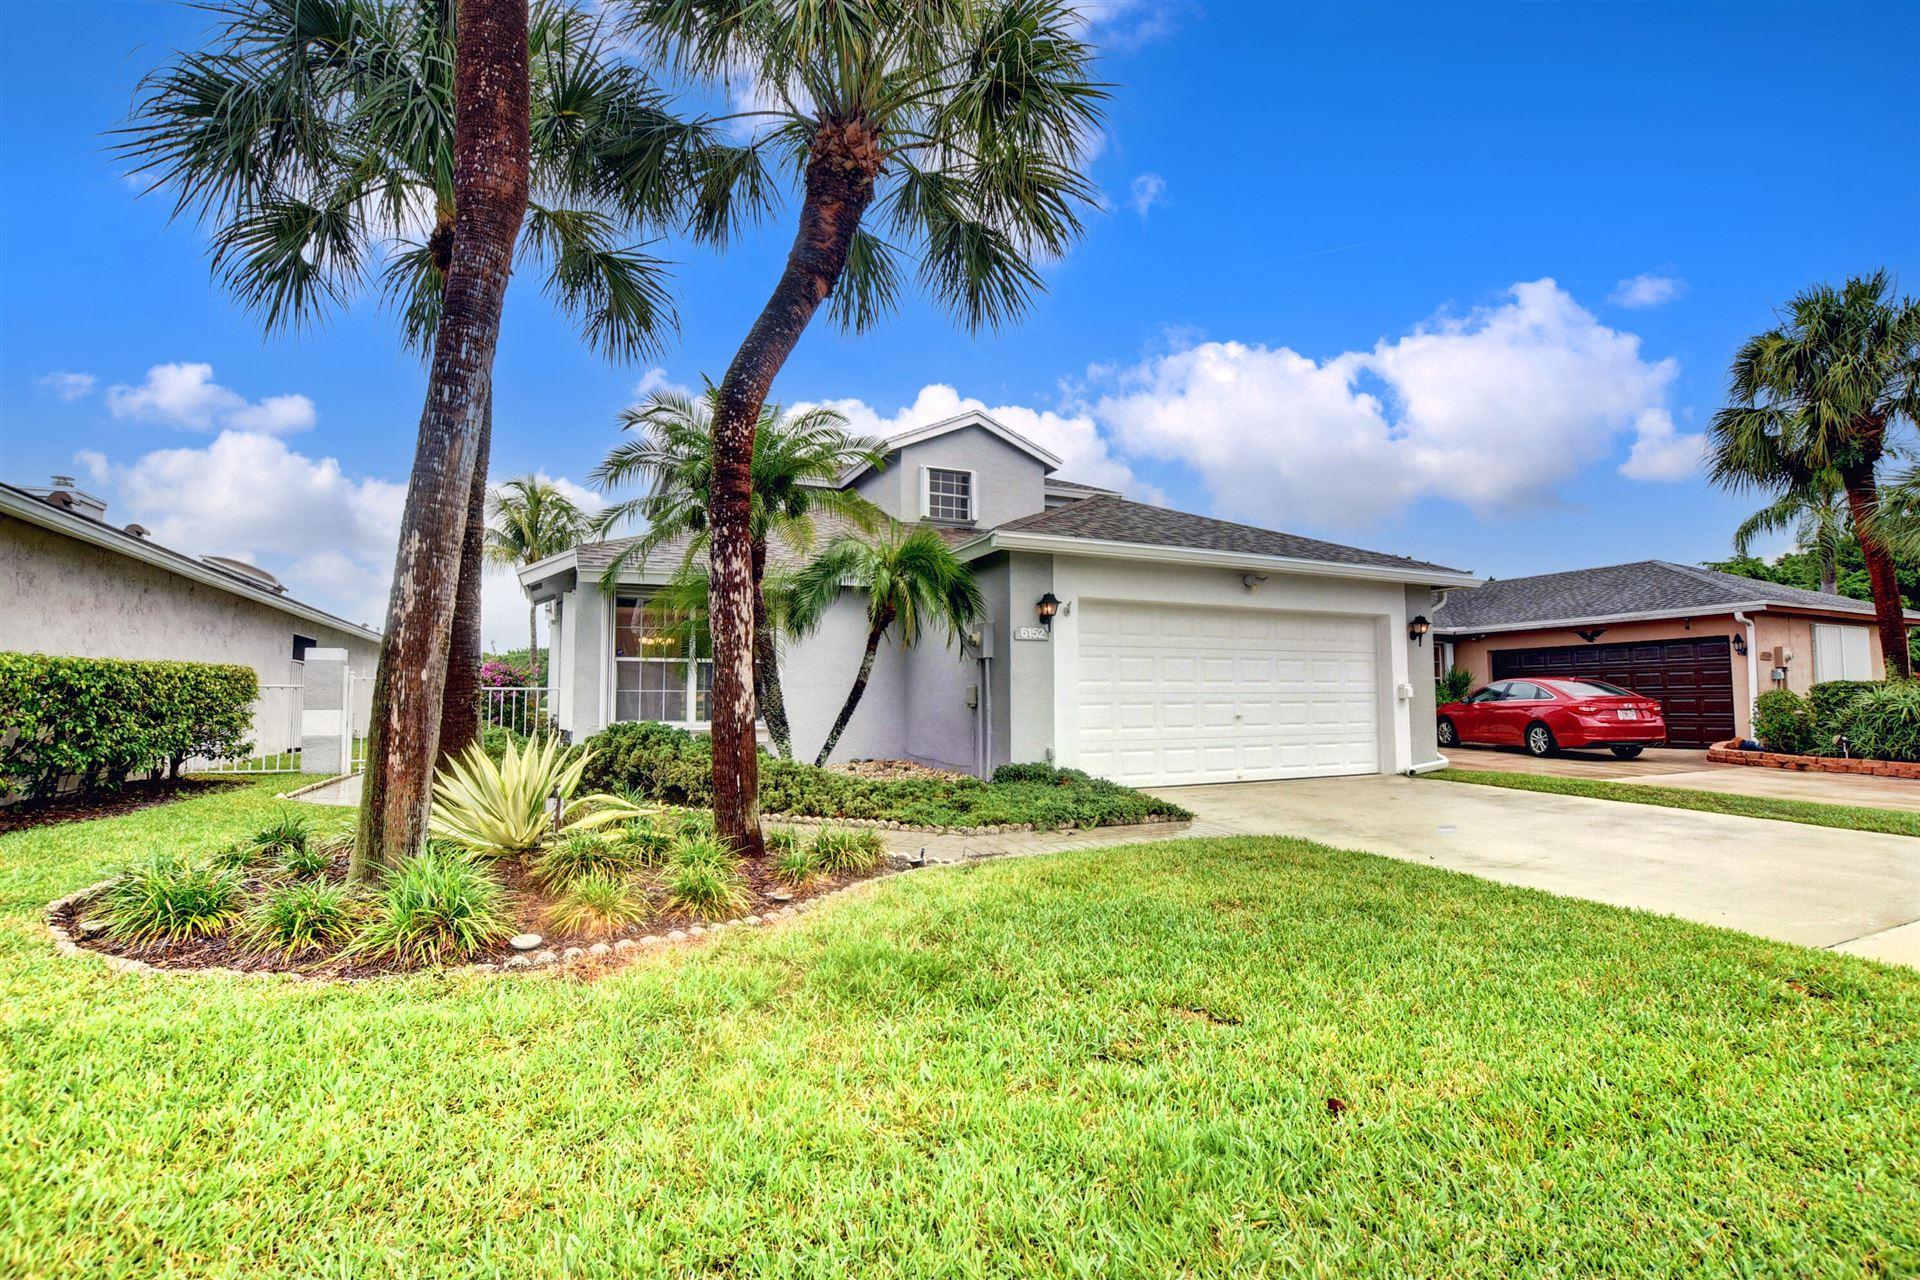 Photo of 6152 Lansdowne Circle, Boynton Beach, FL 33472 (MLS # RX-10725725)